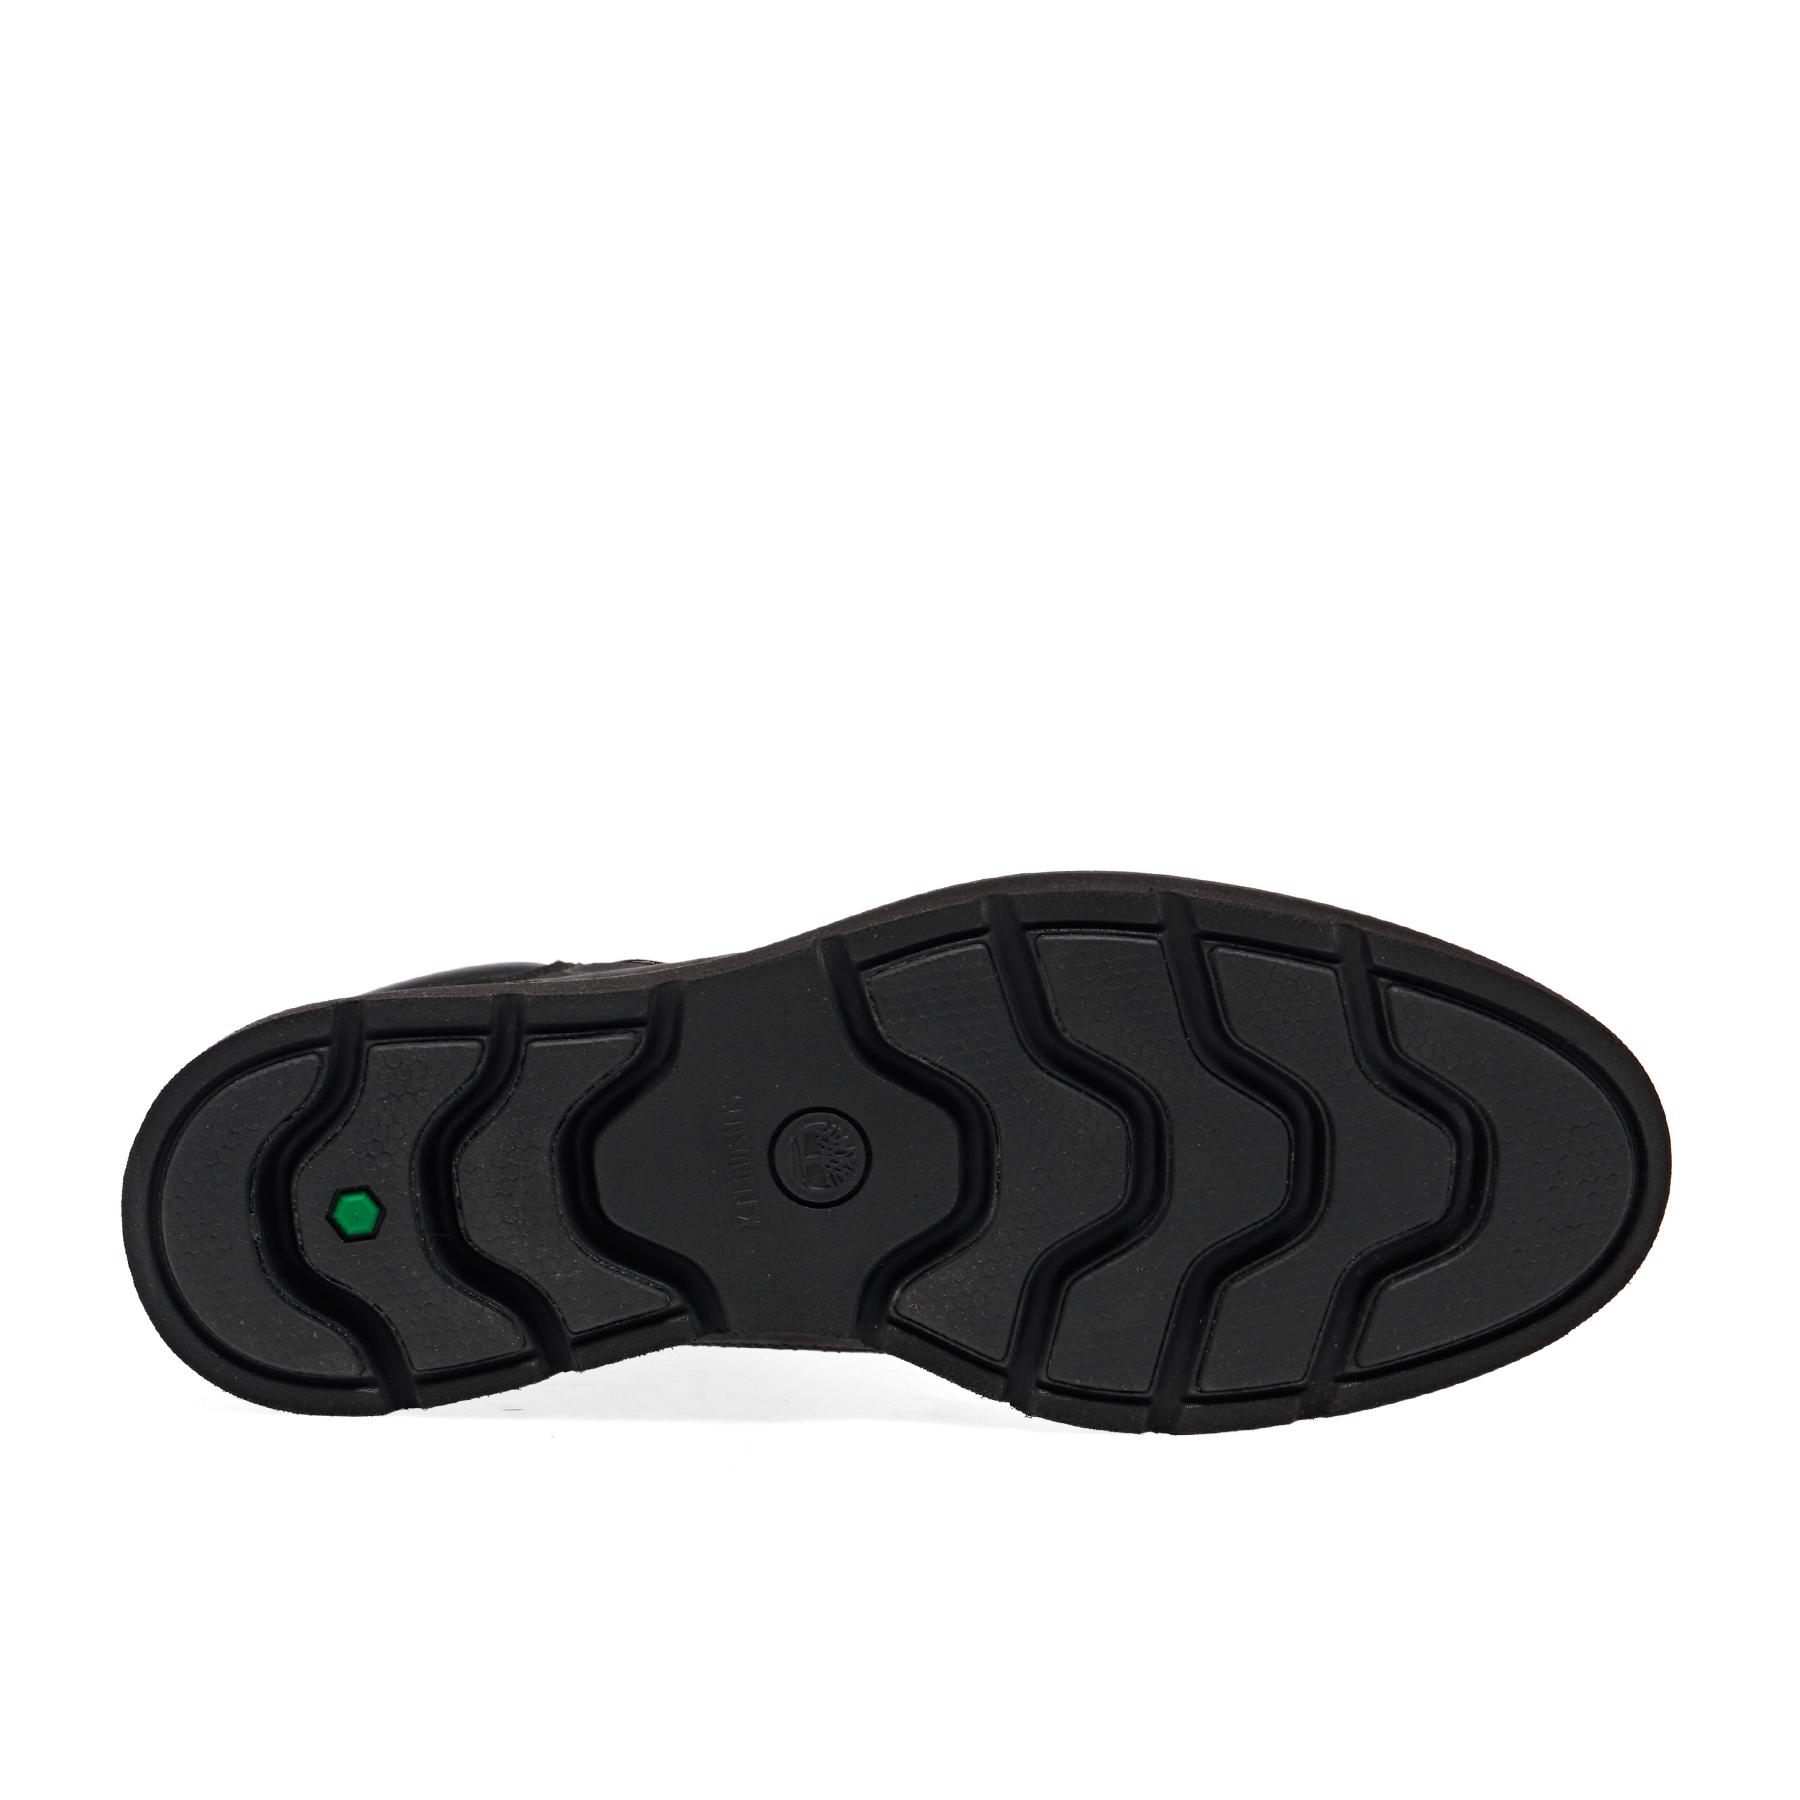 Timberland Kenniston Nellie Womens Boots Gratis leveransalternativ  Free Delivery Options